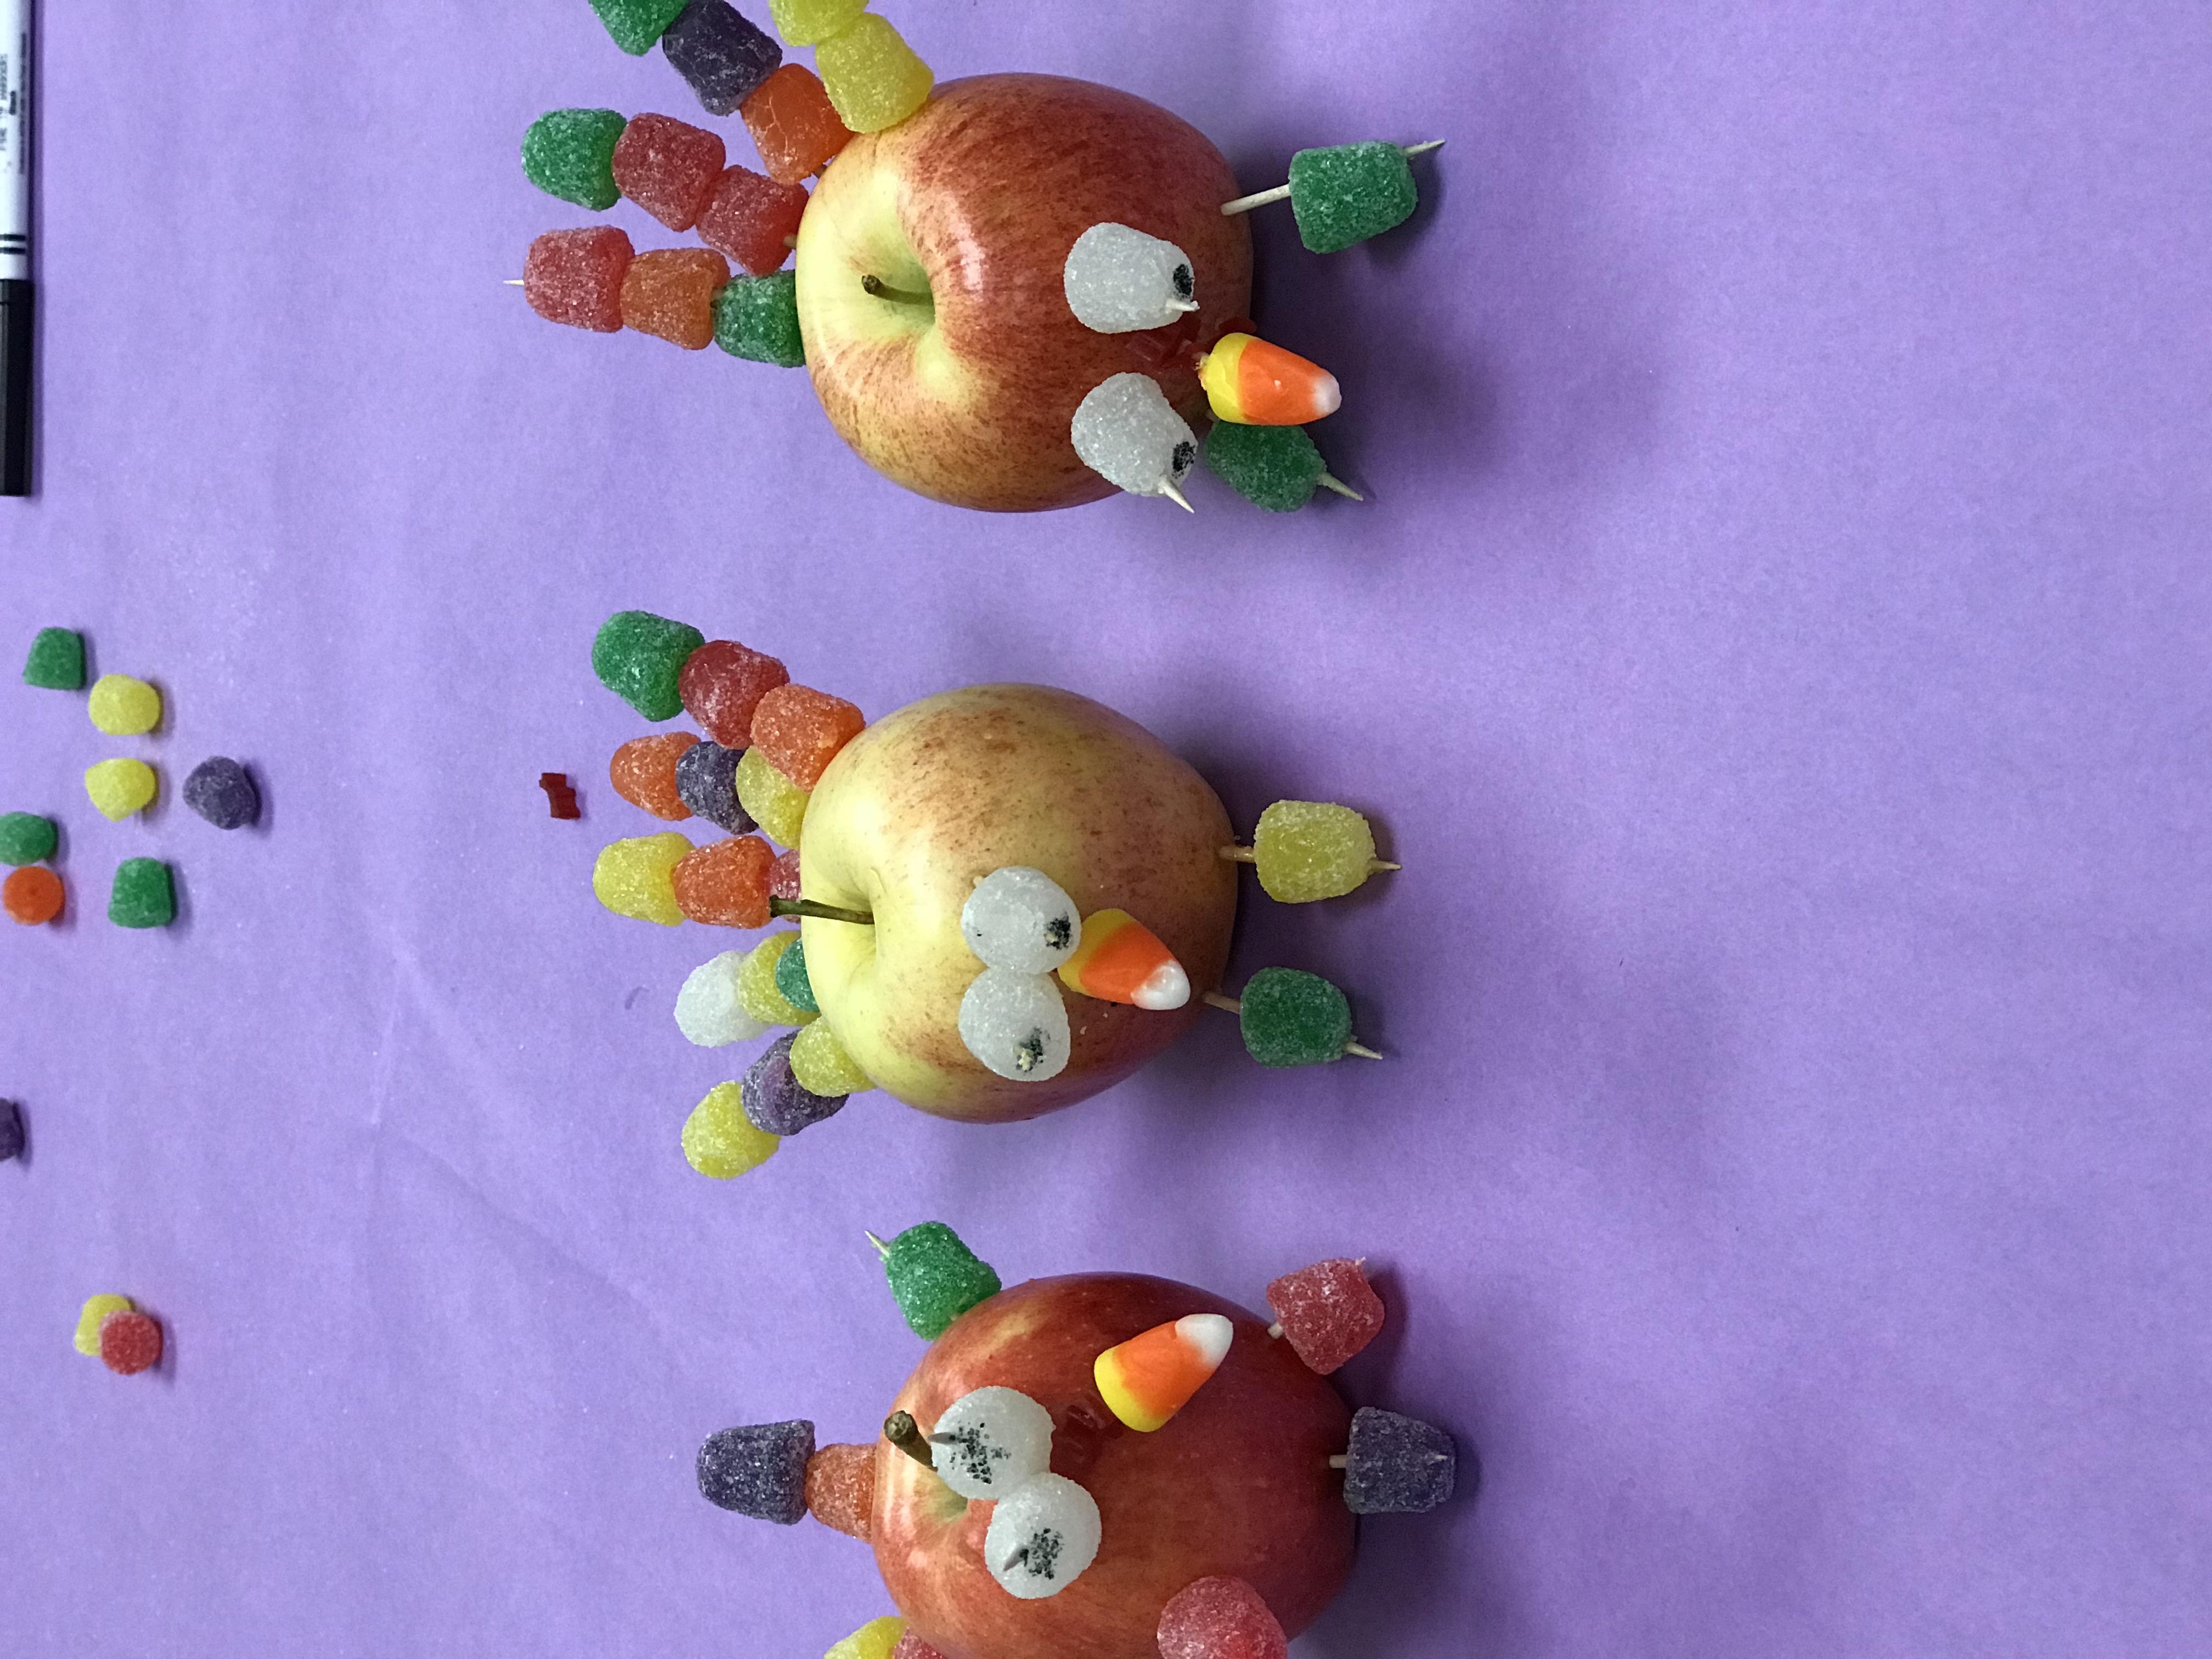 Turkey apples with toothpicks of gumdrops